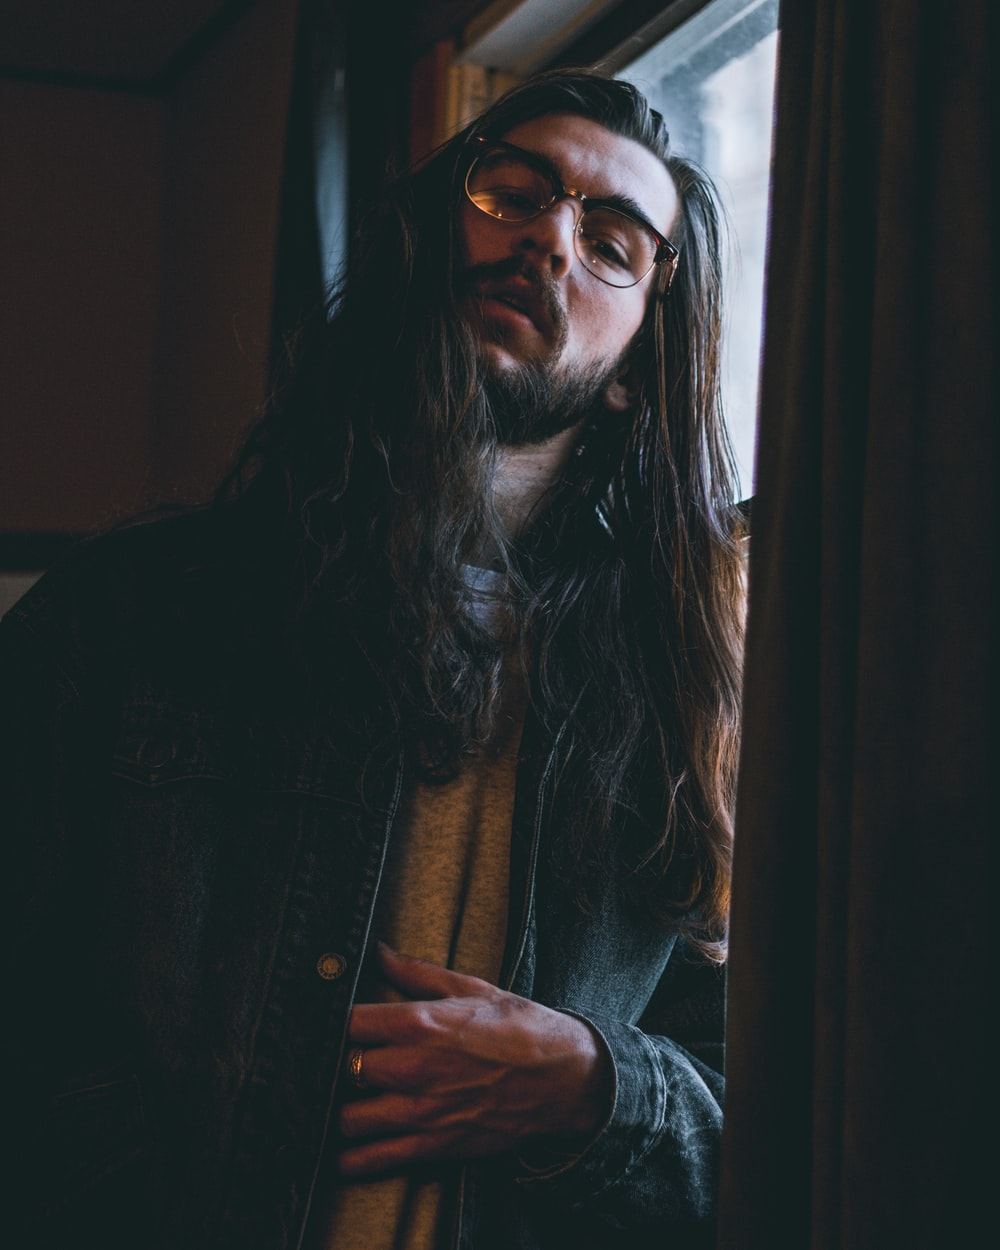 long haired man wearing eyeglasses and blue denim jacket leaning on window